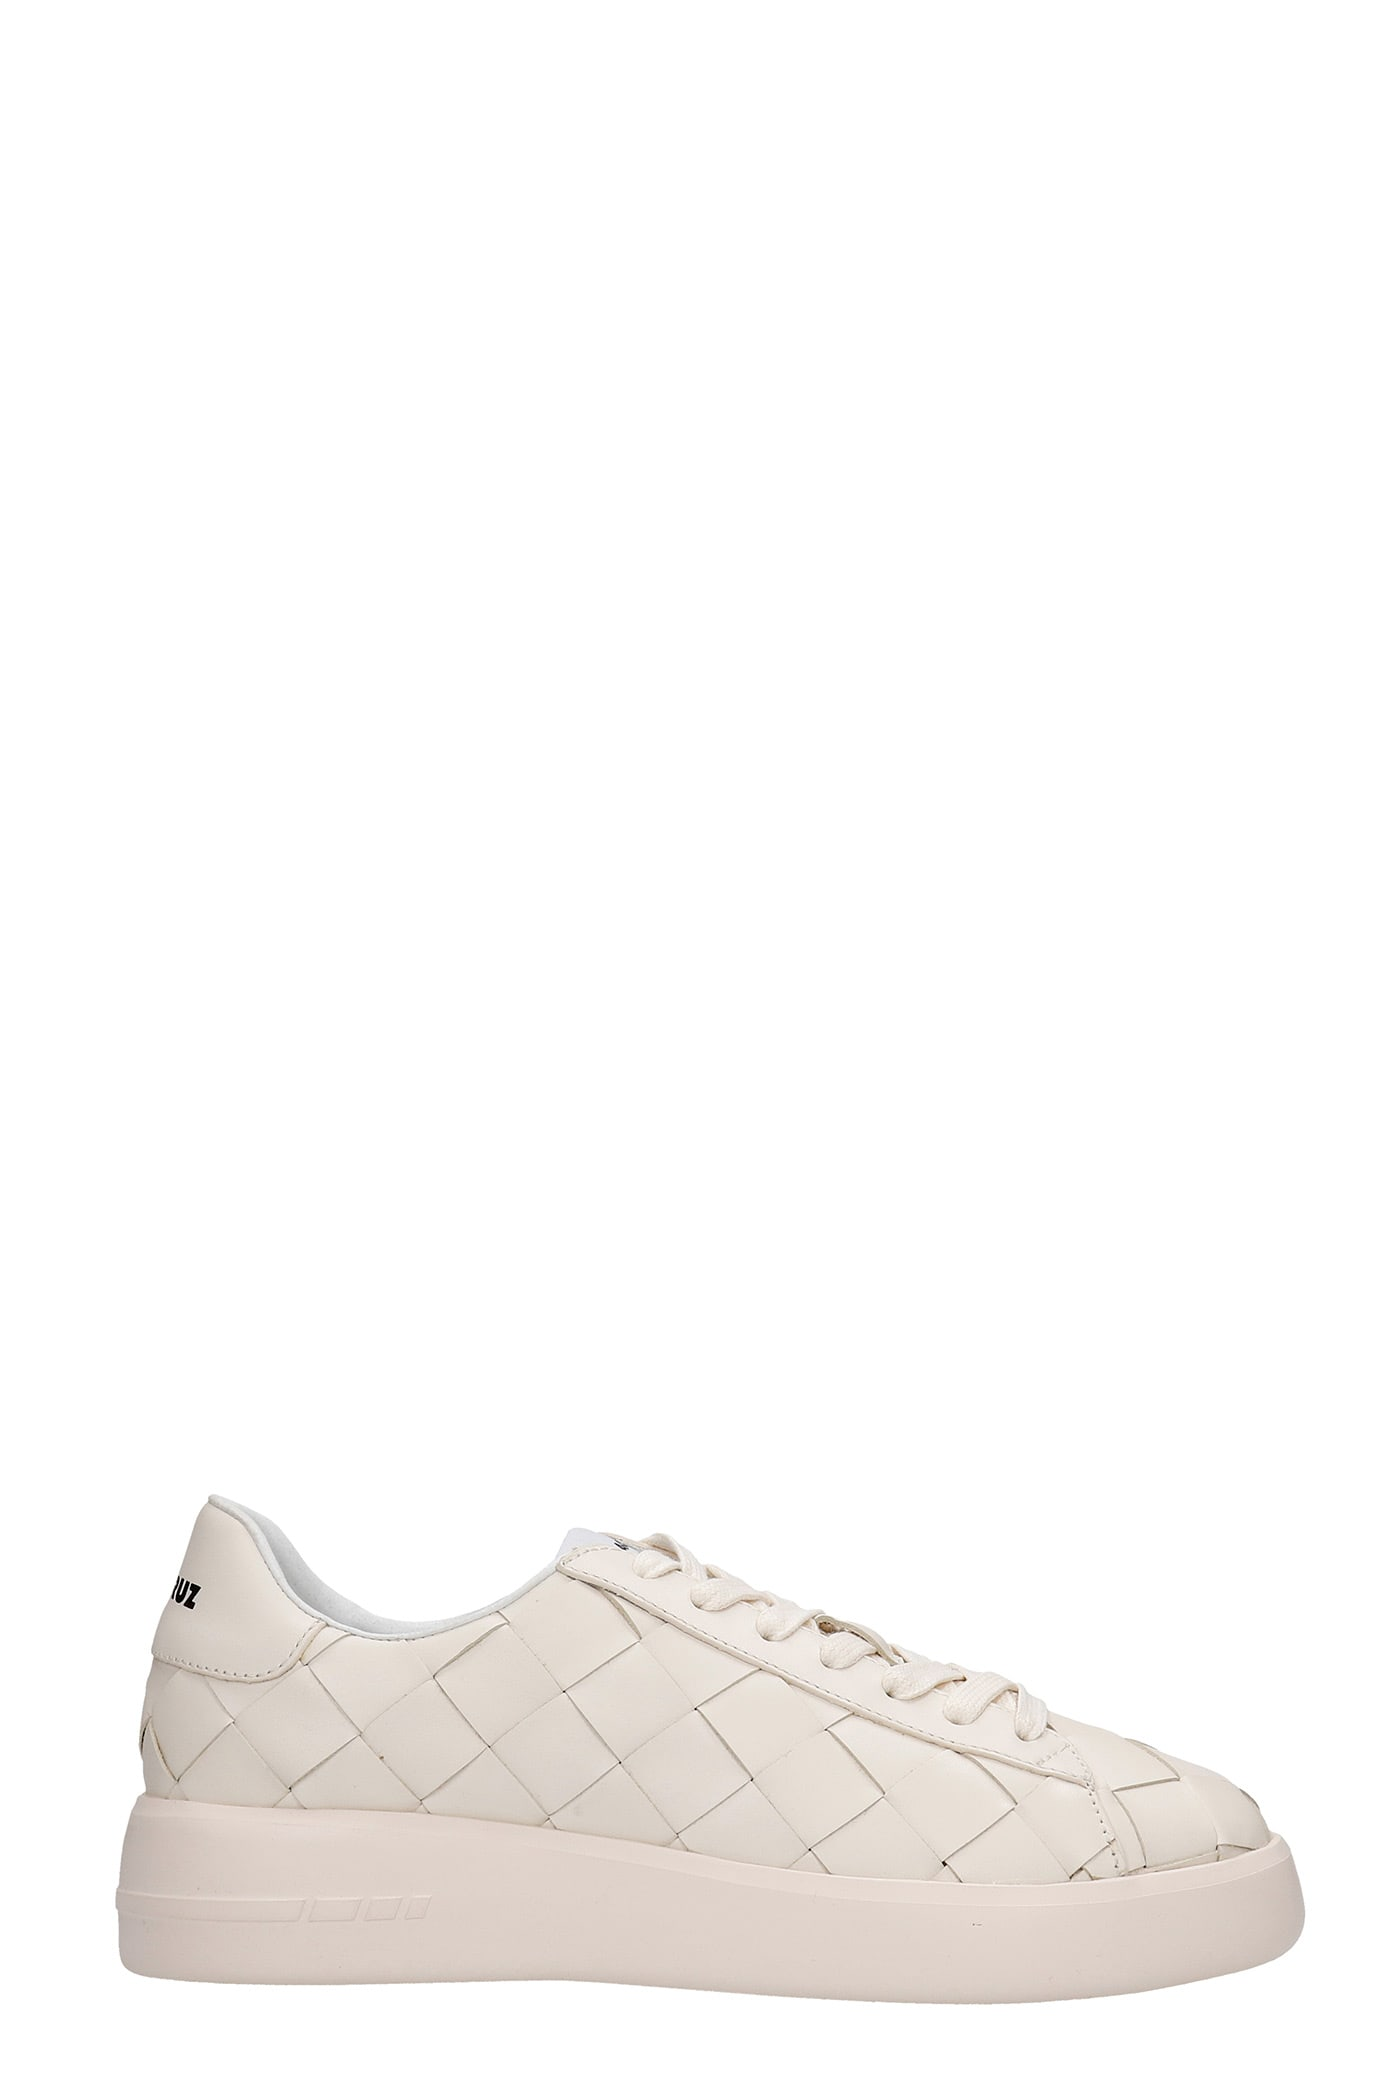 Sneakers In Beige Leather